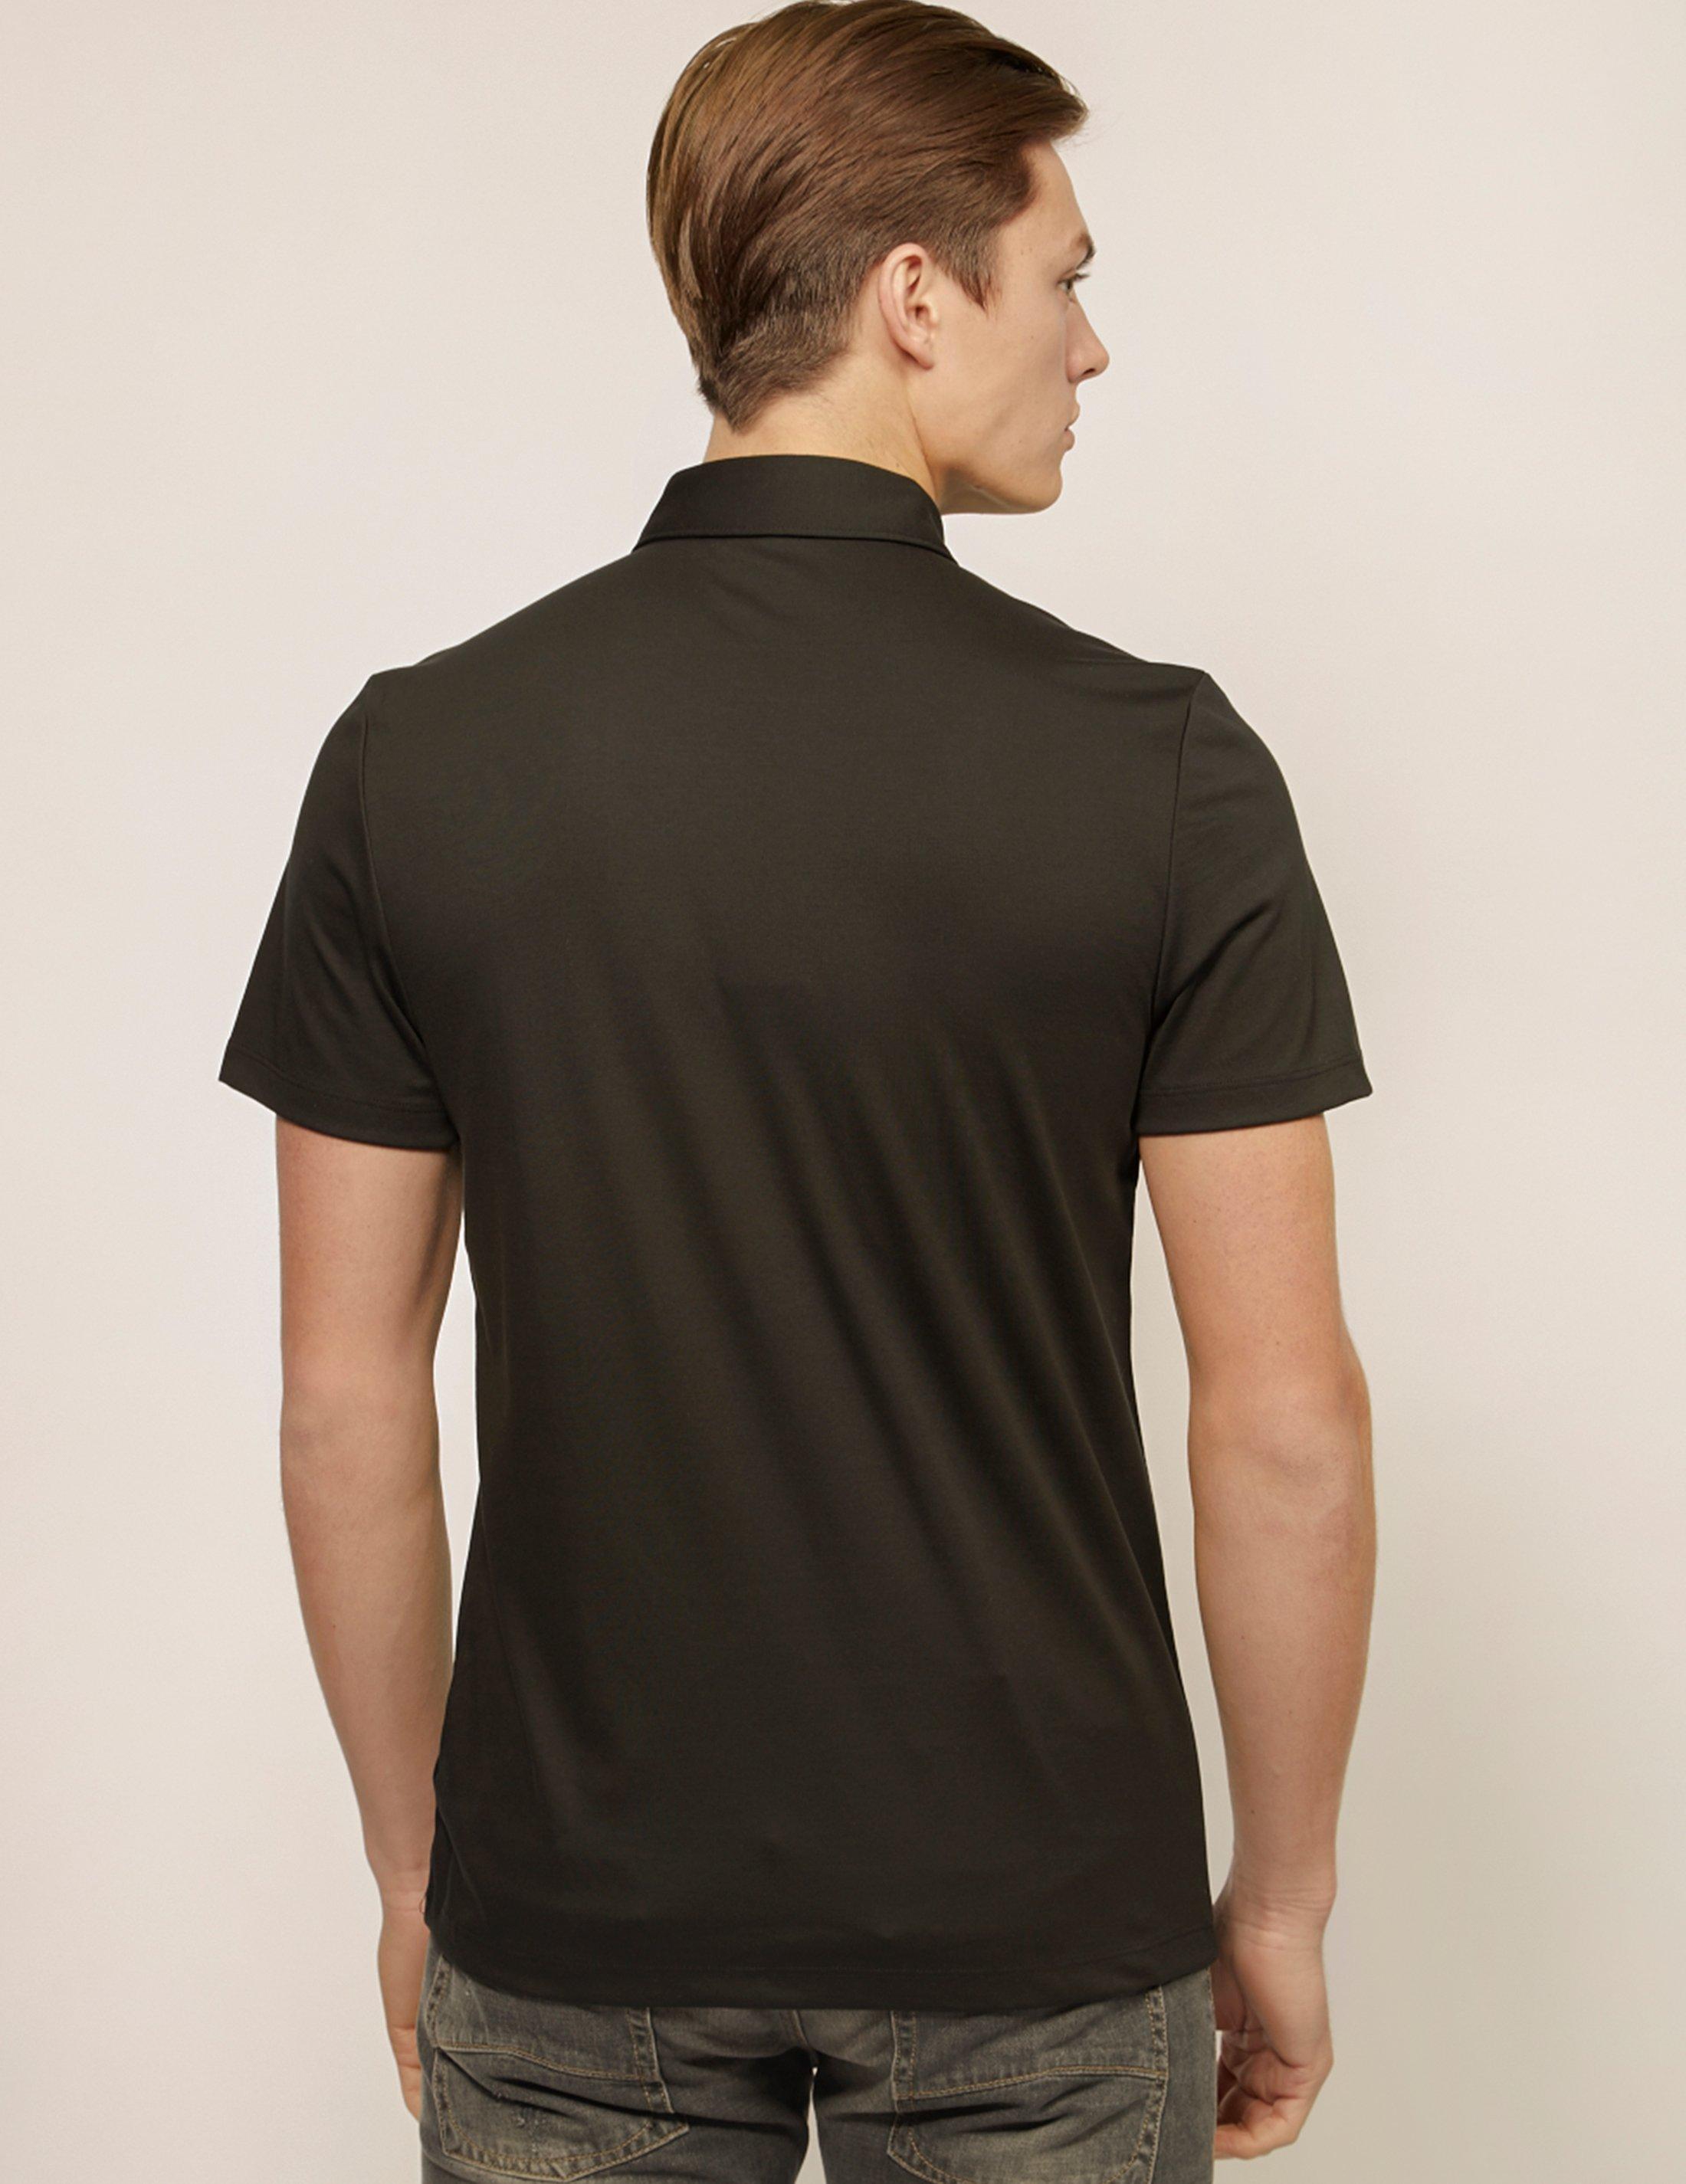 fa5a1fcb Lyst - Michael Kors Mens Sleek Short Sleeve Polo Shirt Black in Black for  Men